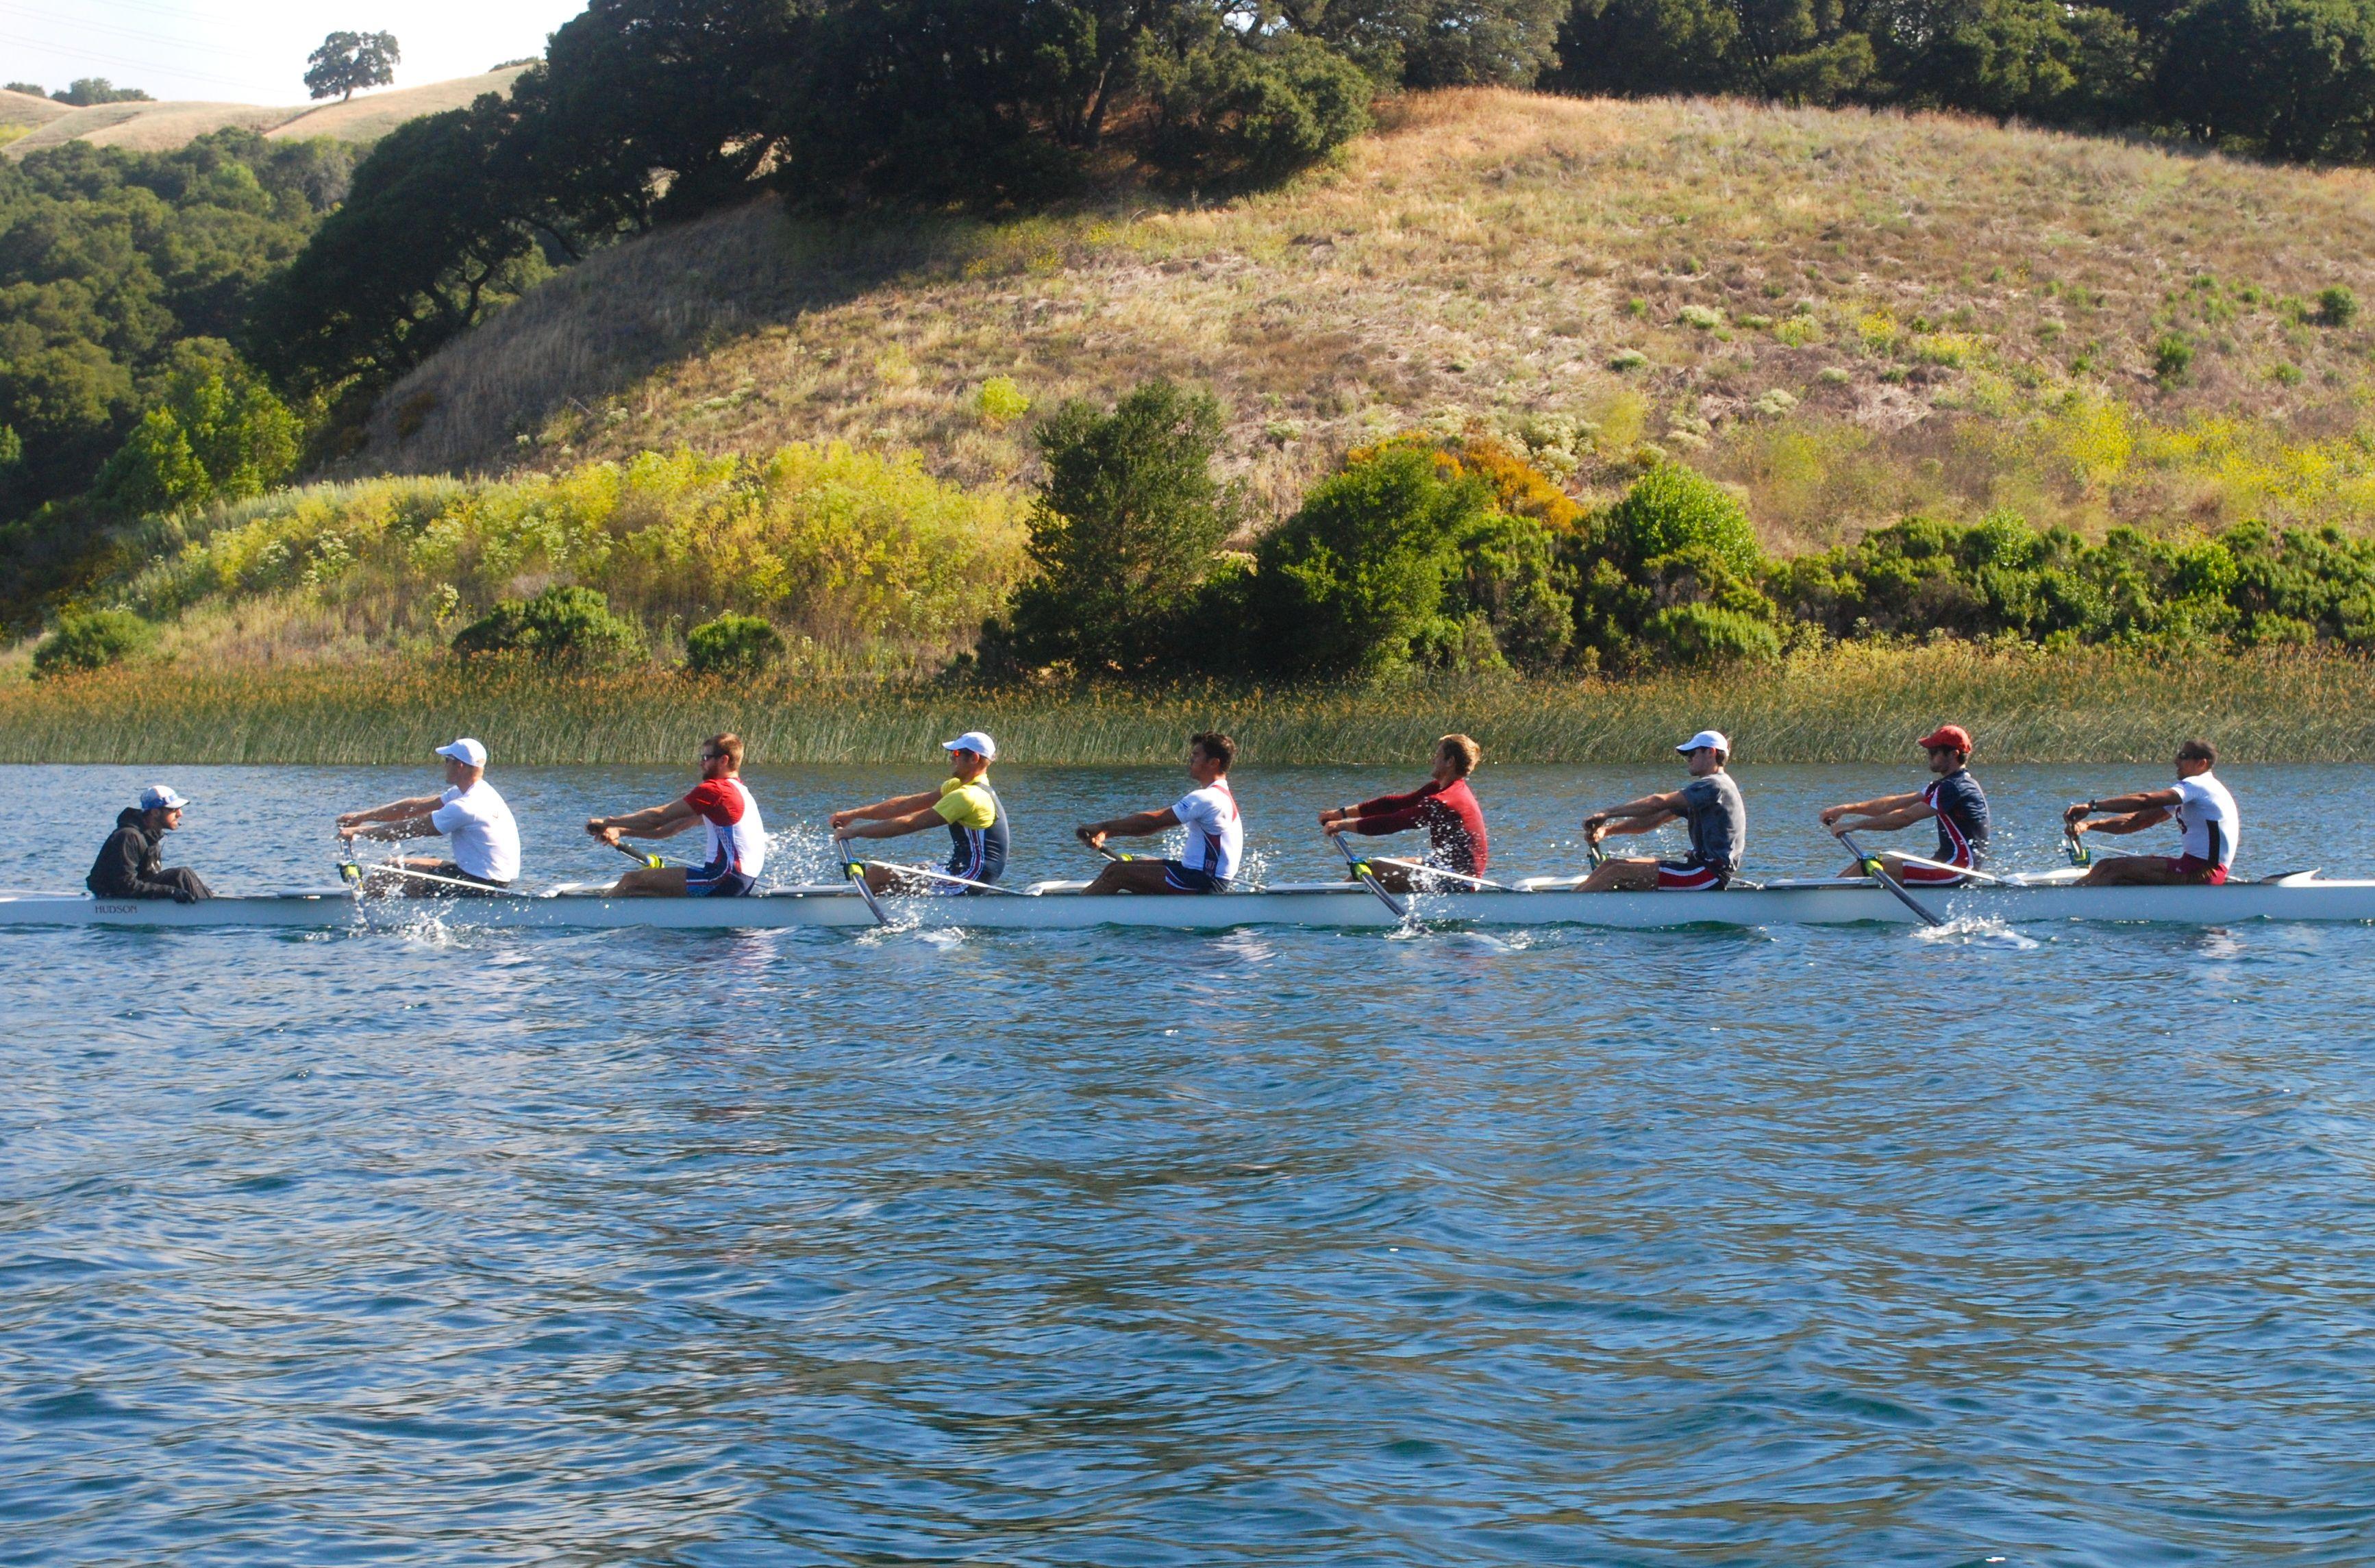 2012-07-09-rowingolympics2.jpg